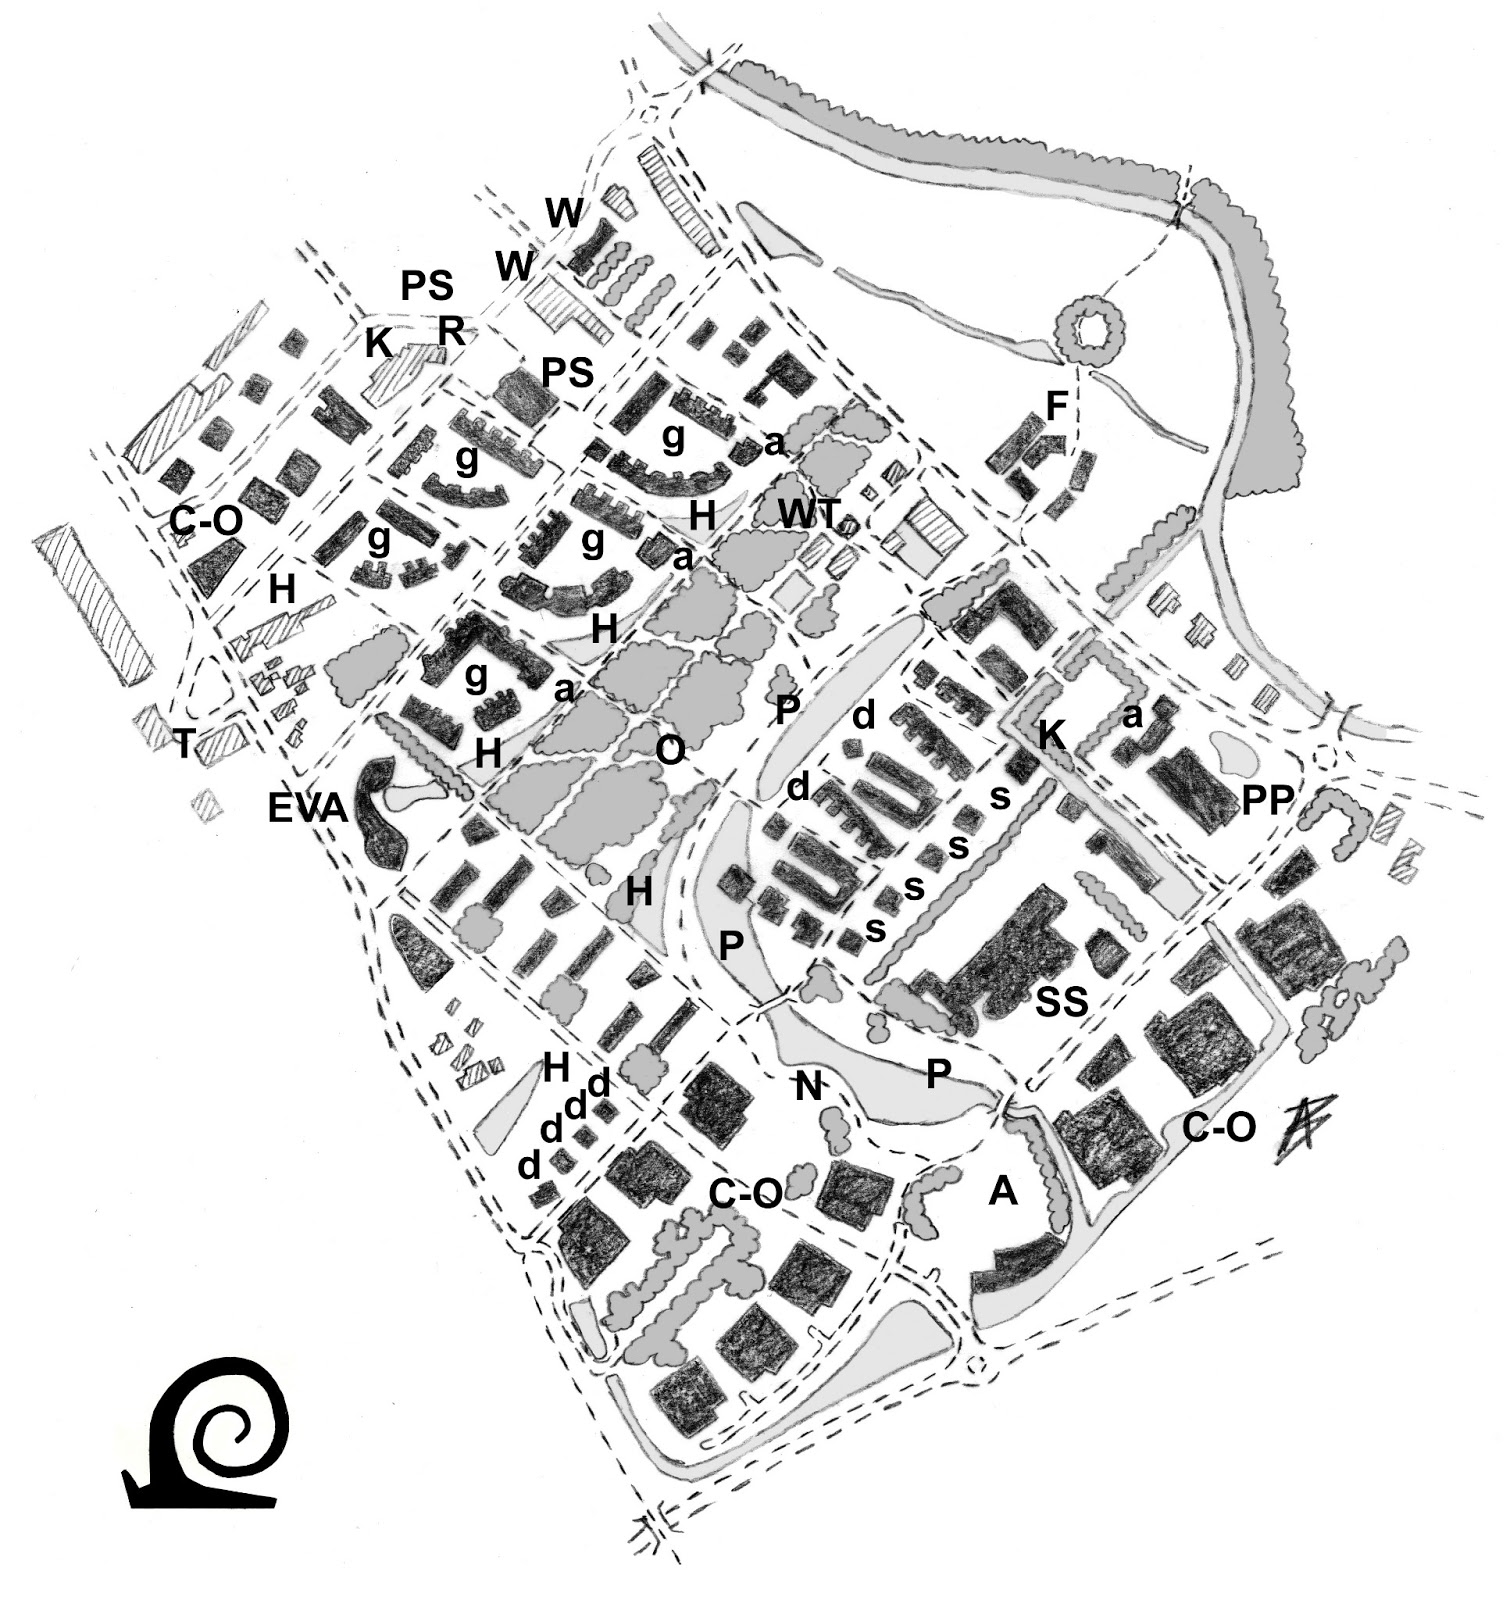 Snail in the City: Models homes: EVA-Lanxmeer, a